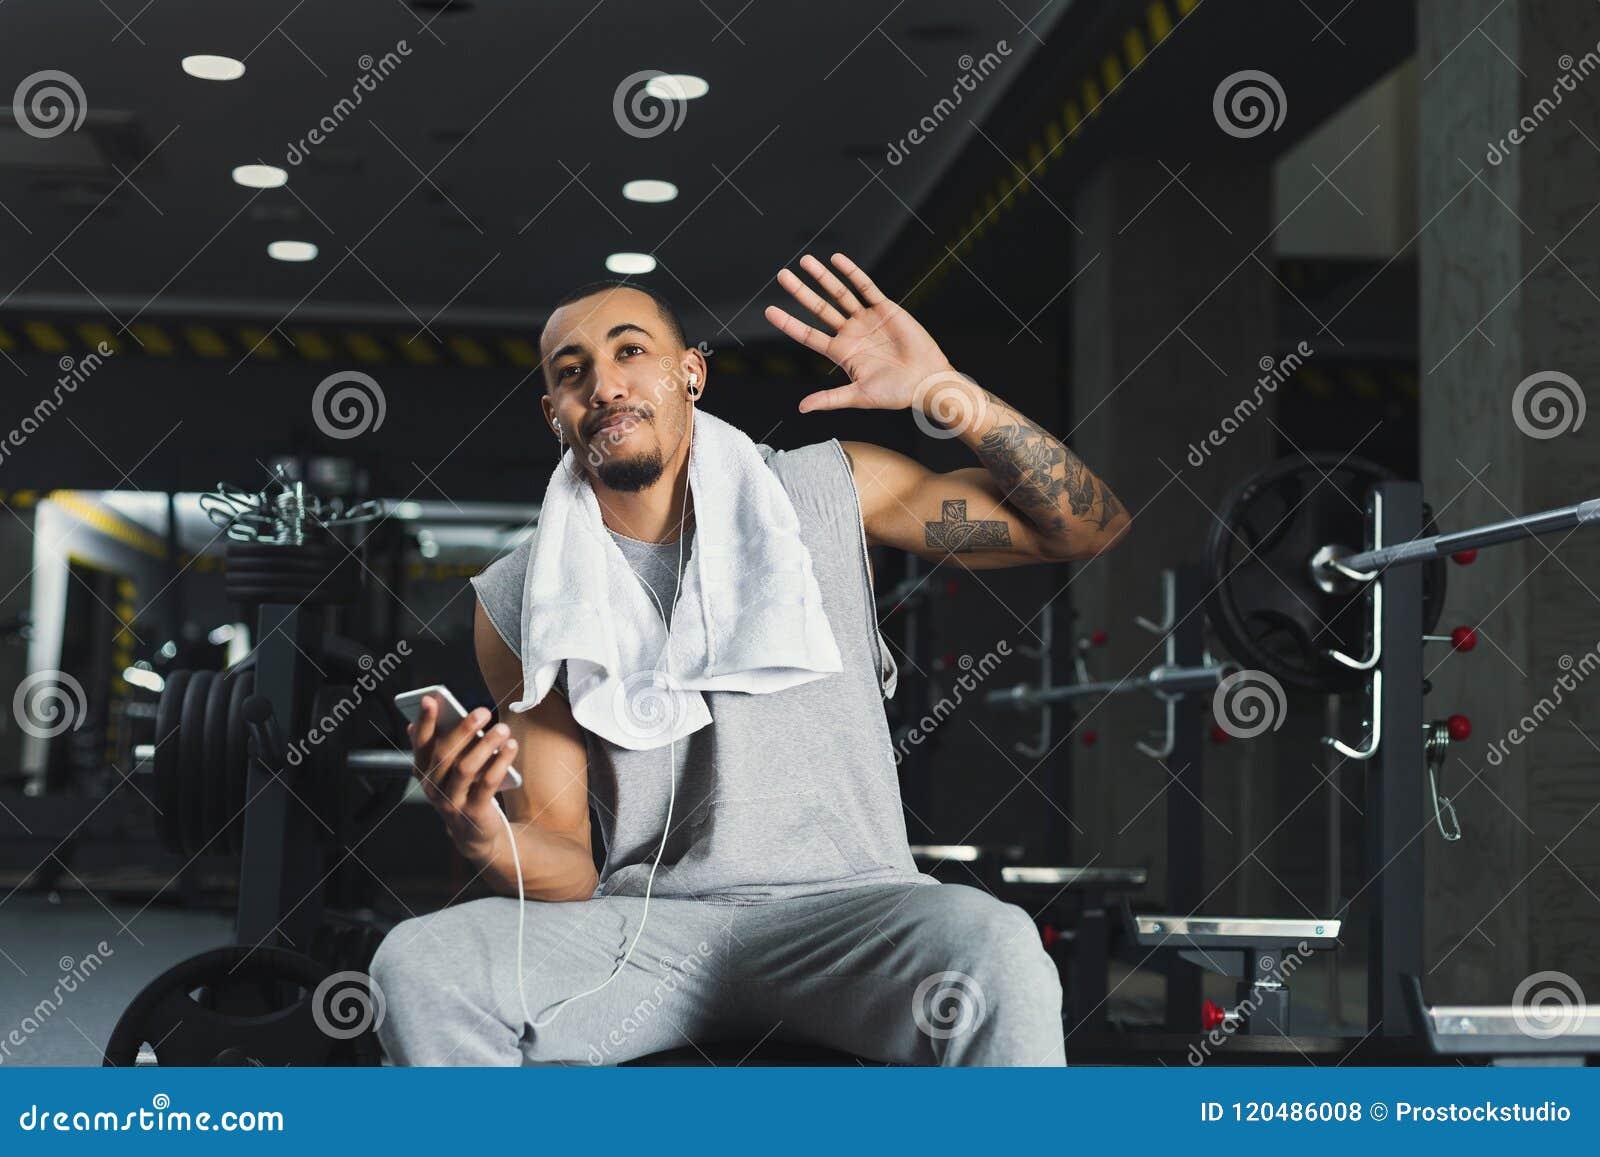 Sportsman In Headphones Choose Music On Phone Stock Photo Image Of